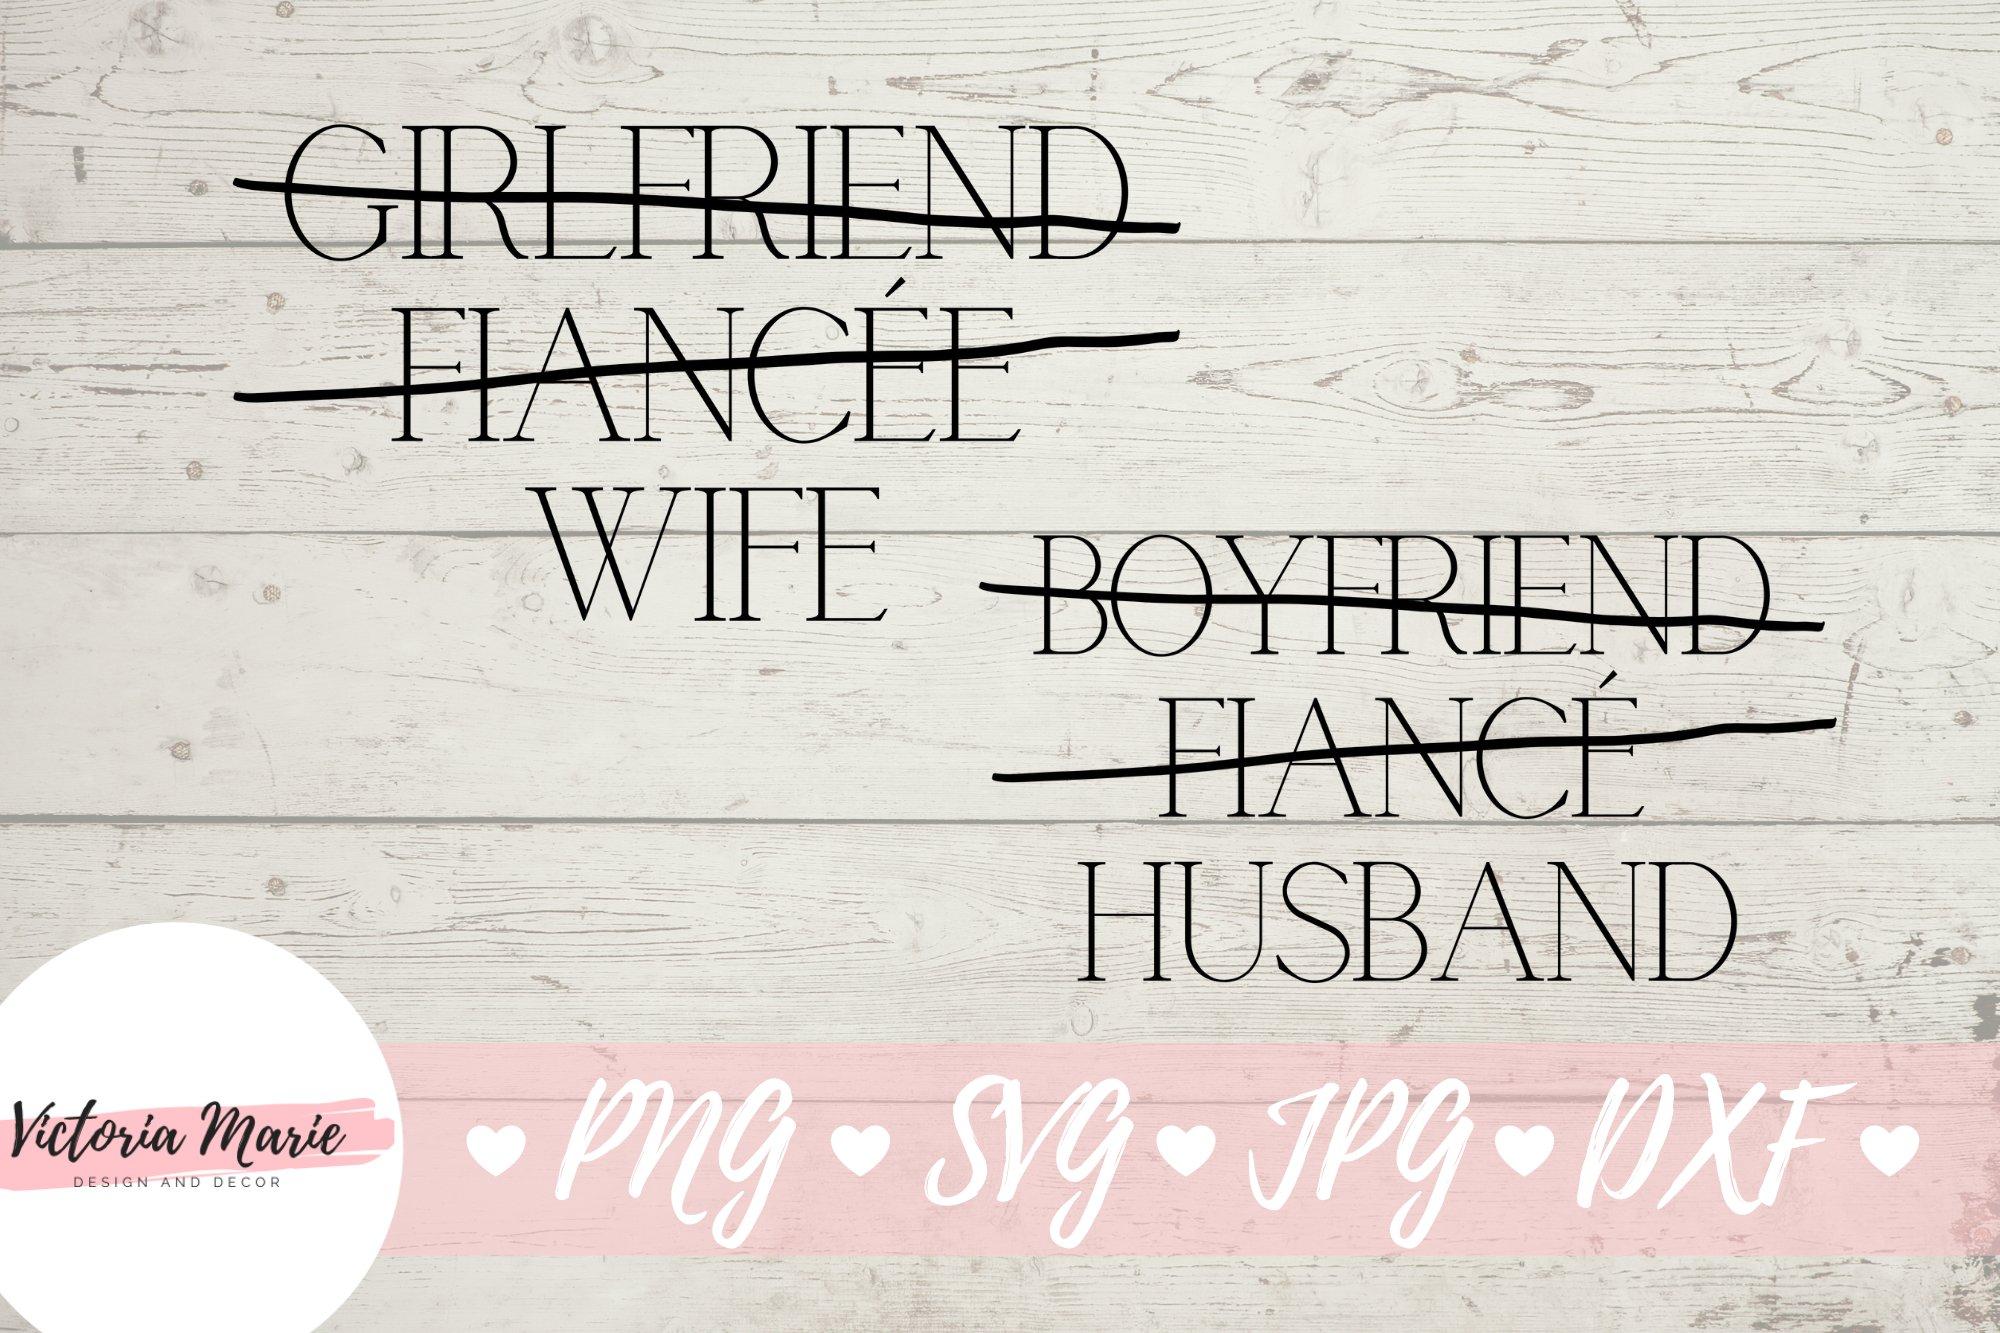 Girlfriend Fiancee Wife svg, Boyfriend Fiance Husband svg example image 1